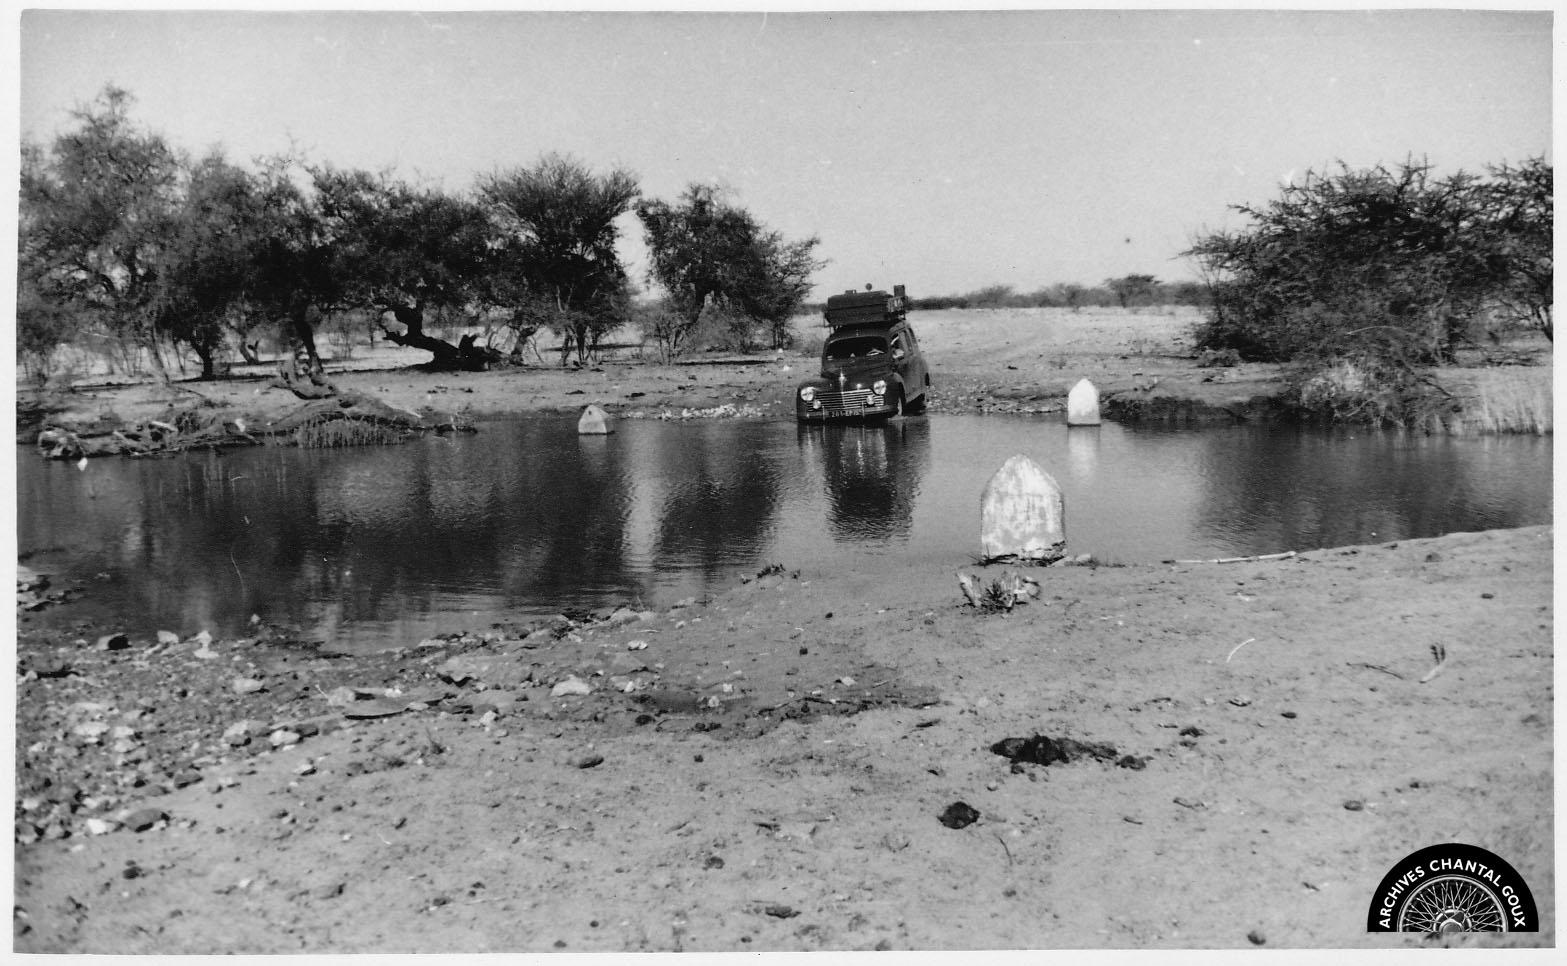 1956_M-C_raid_afrique_3w